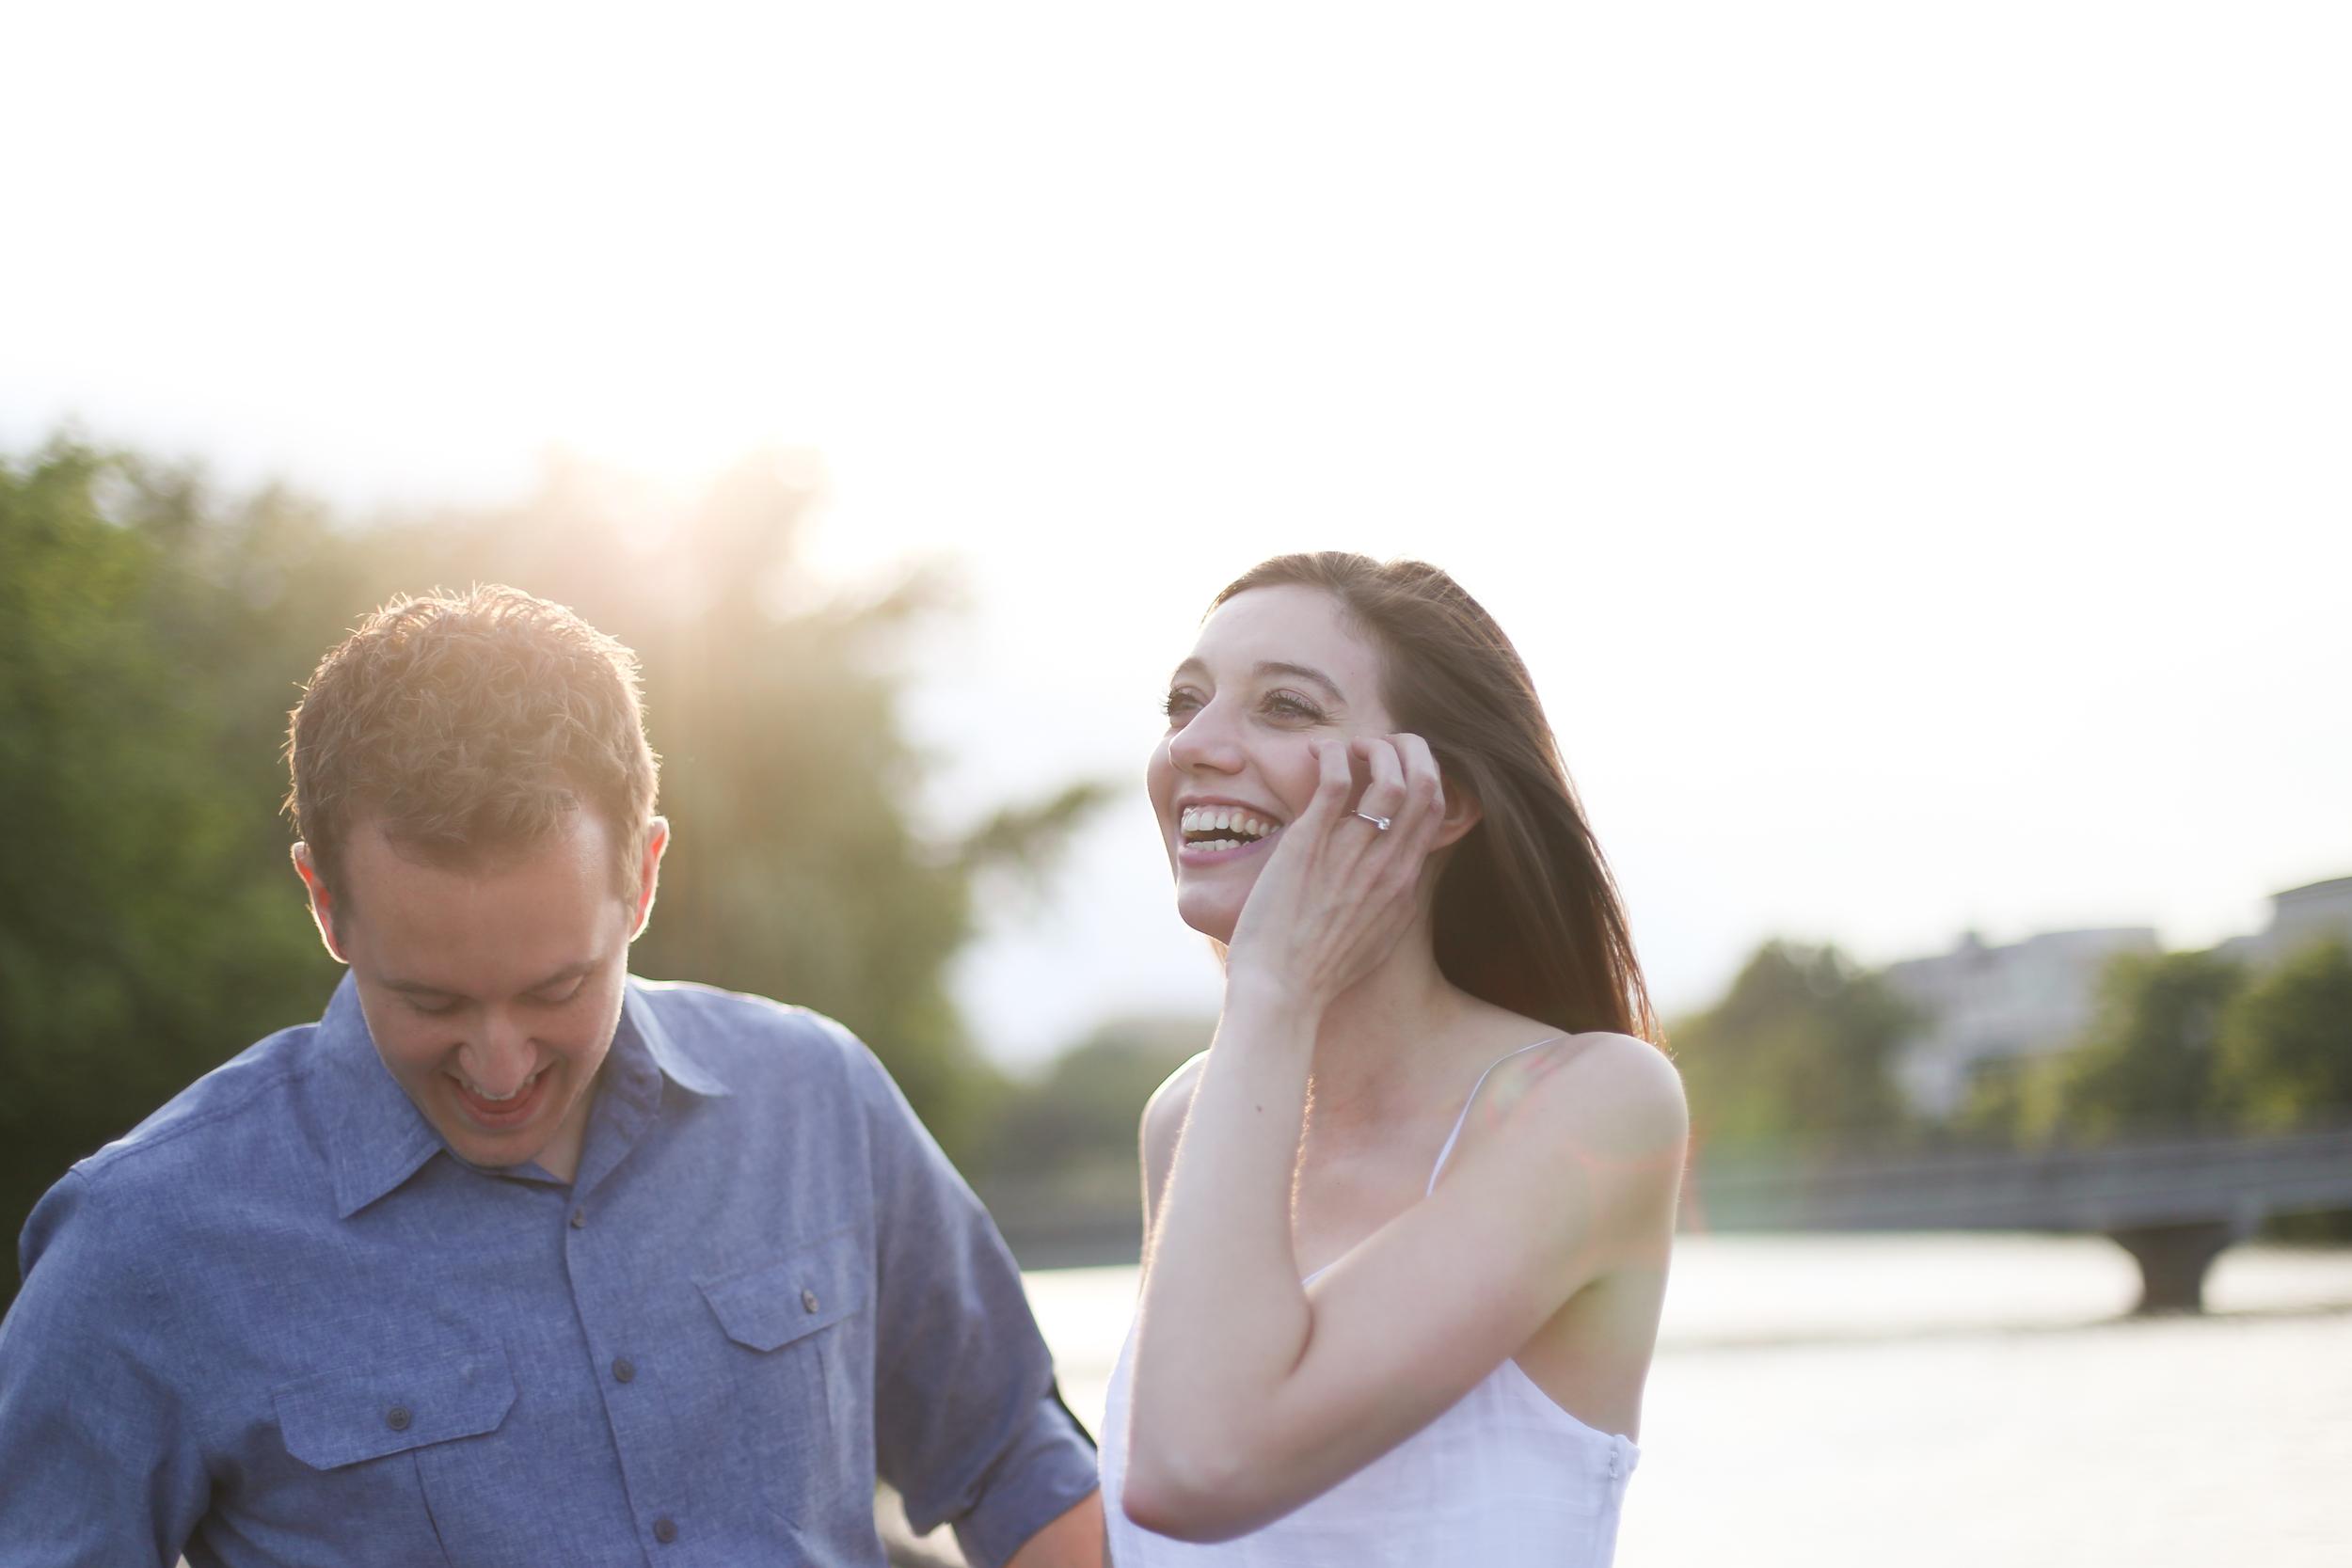 Wisconsin Wedding Photographer - Whit Meza Photography